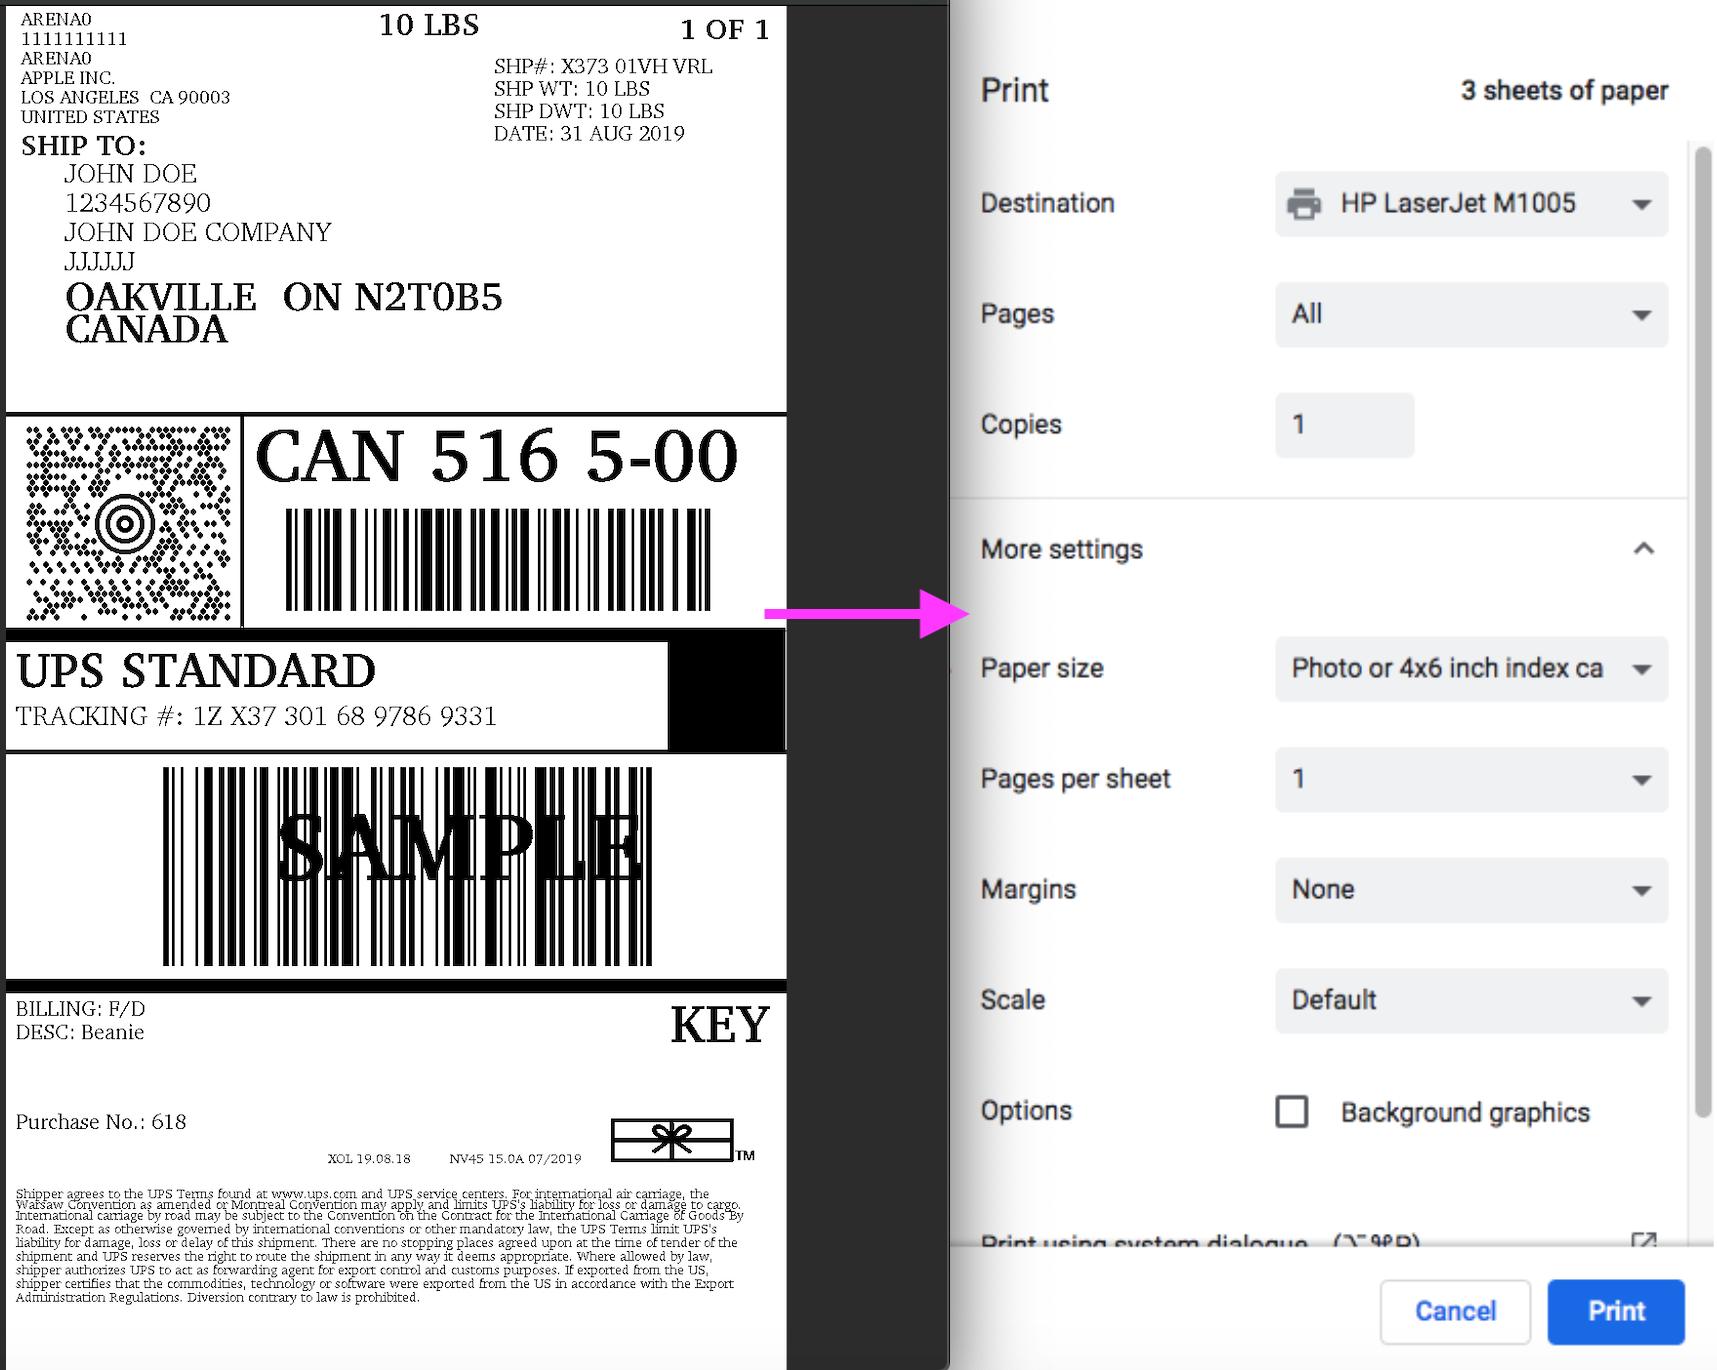 ups label printing mcsl shopify